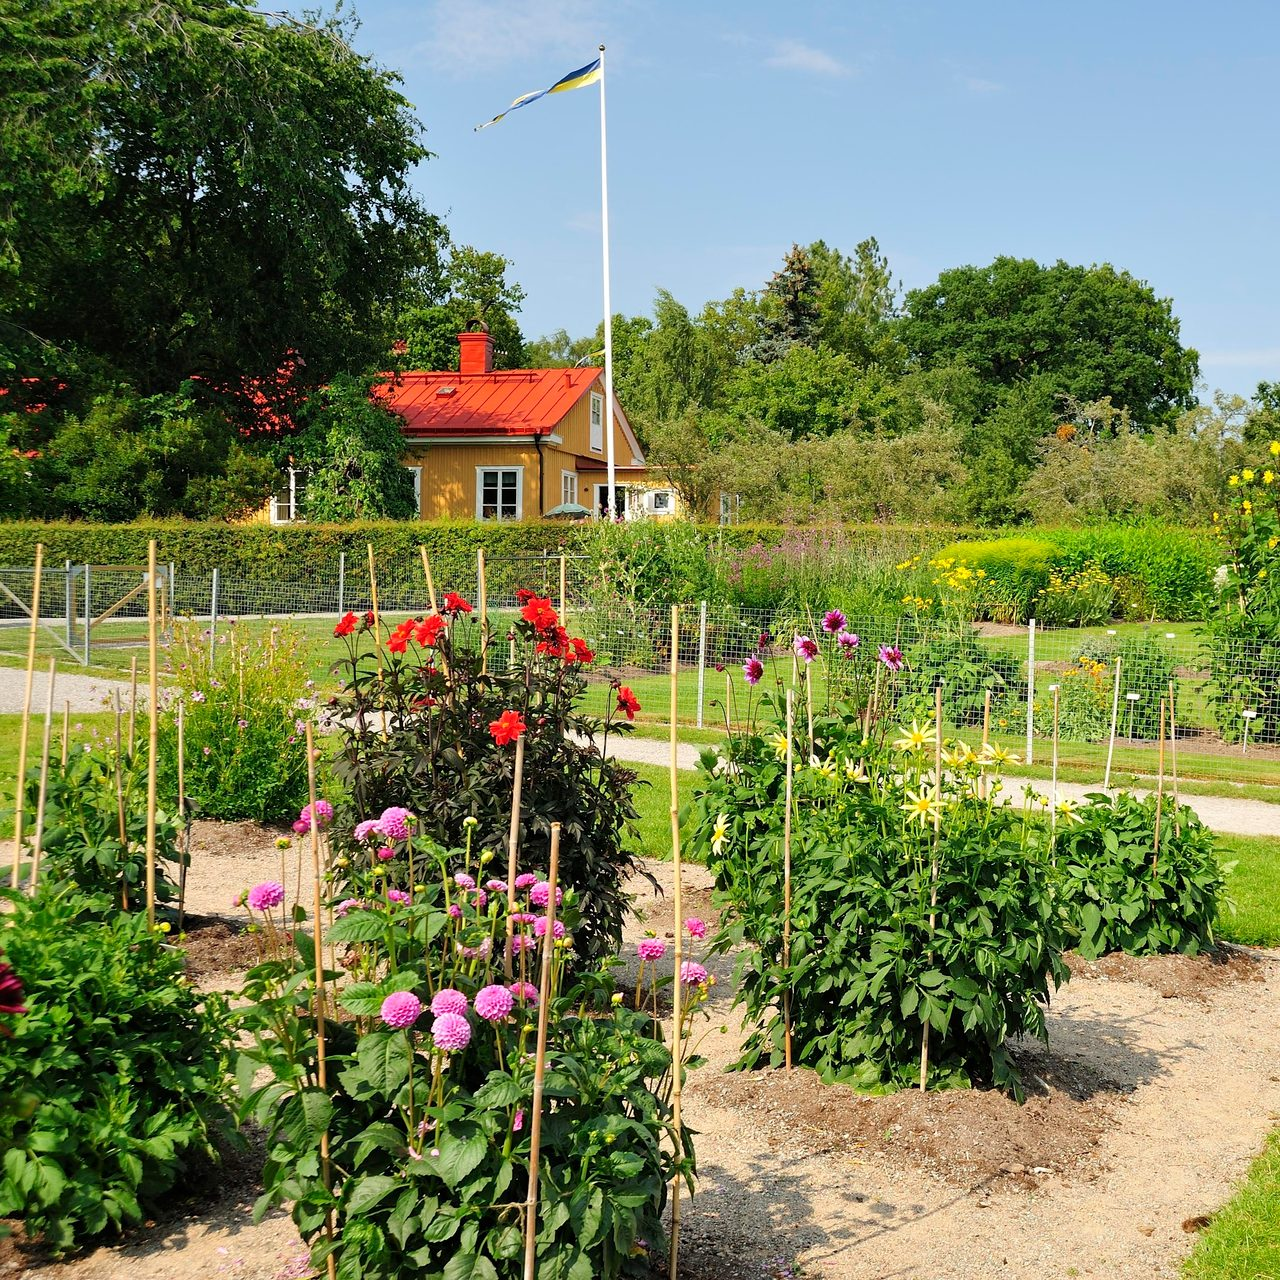 Land lot, Flower, Plant, Sky, Green, Tree, Vegetation, Grass, Shrub, Hedge